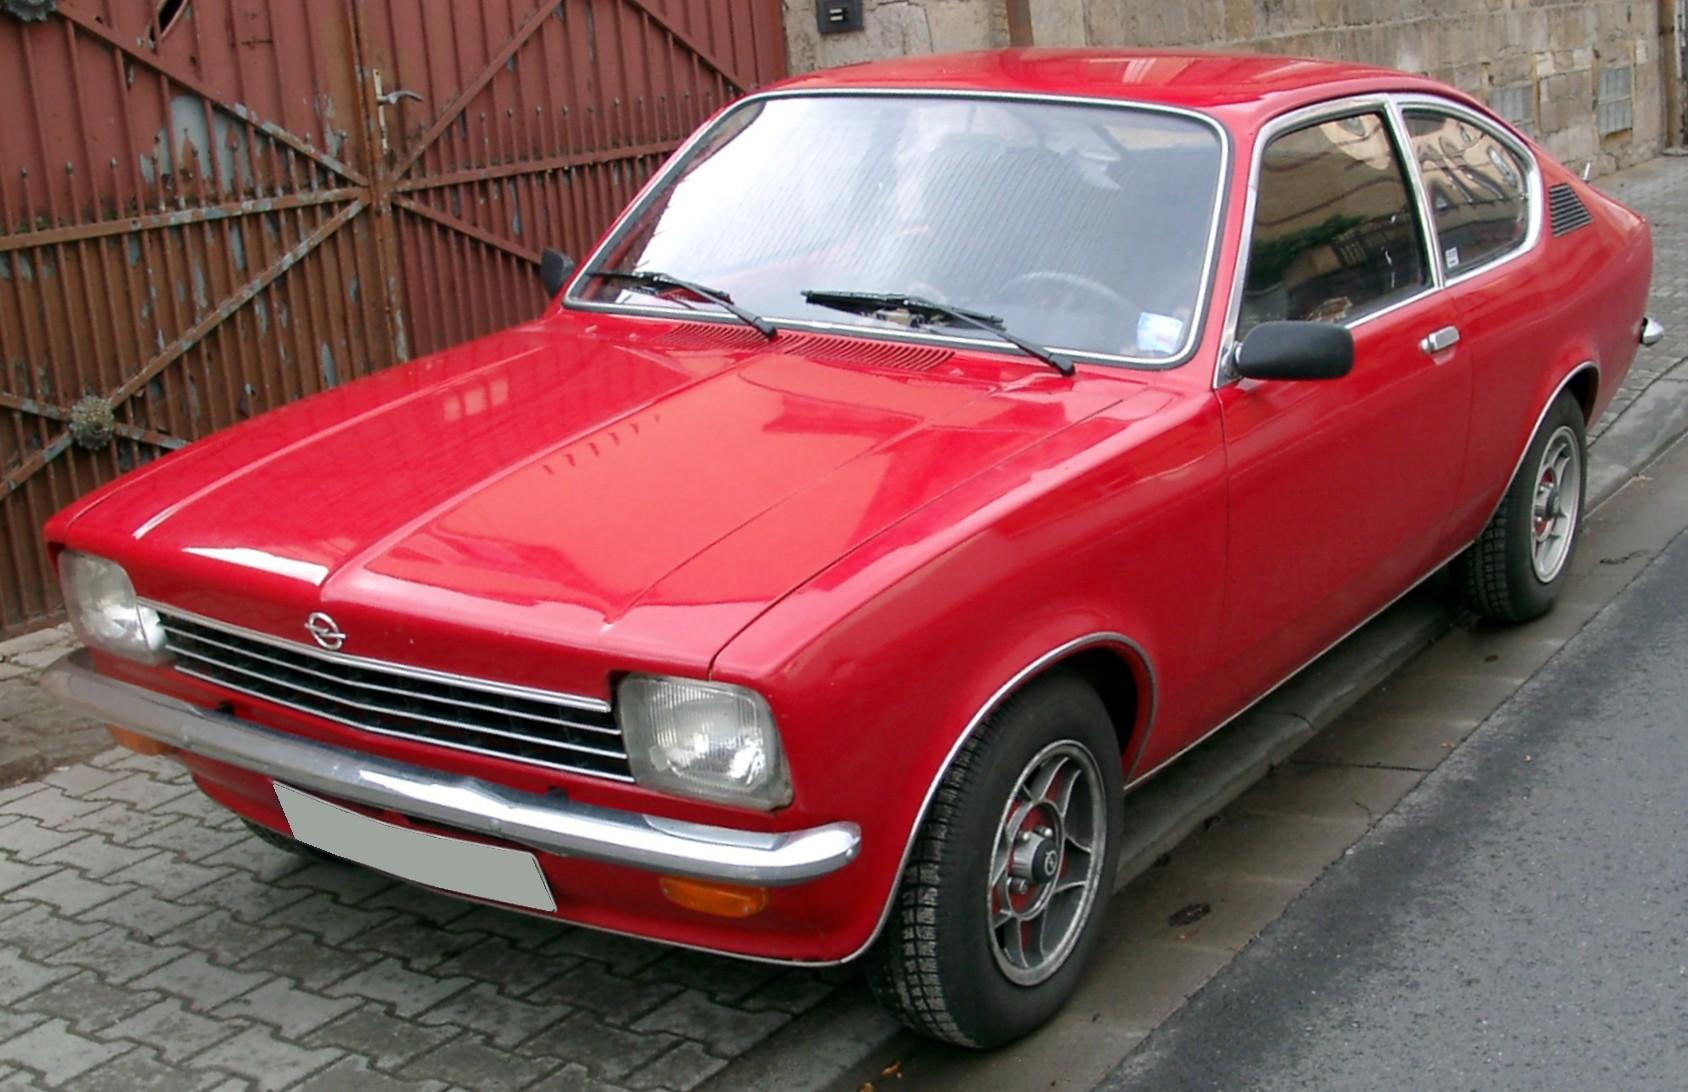 Opel Kadett C 1973 - 1979 Station wagon 3 door #7